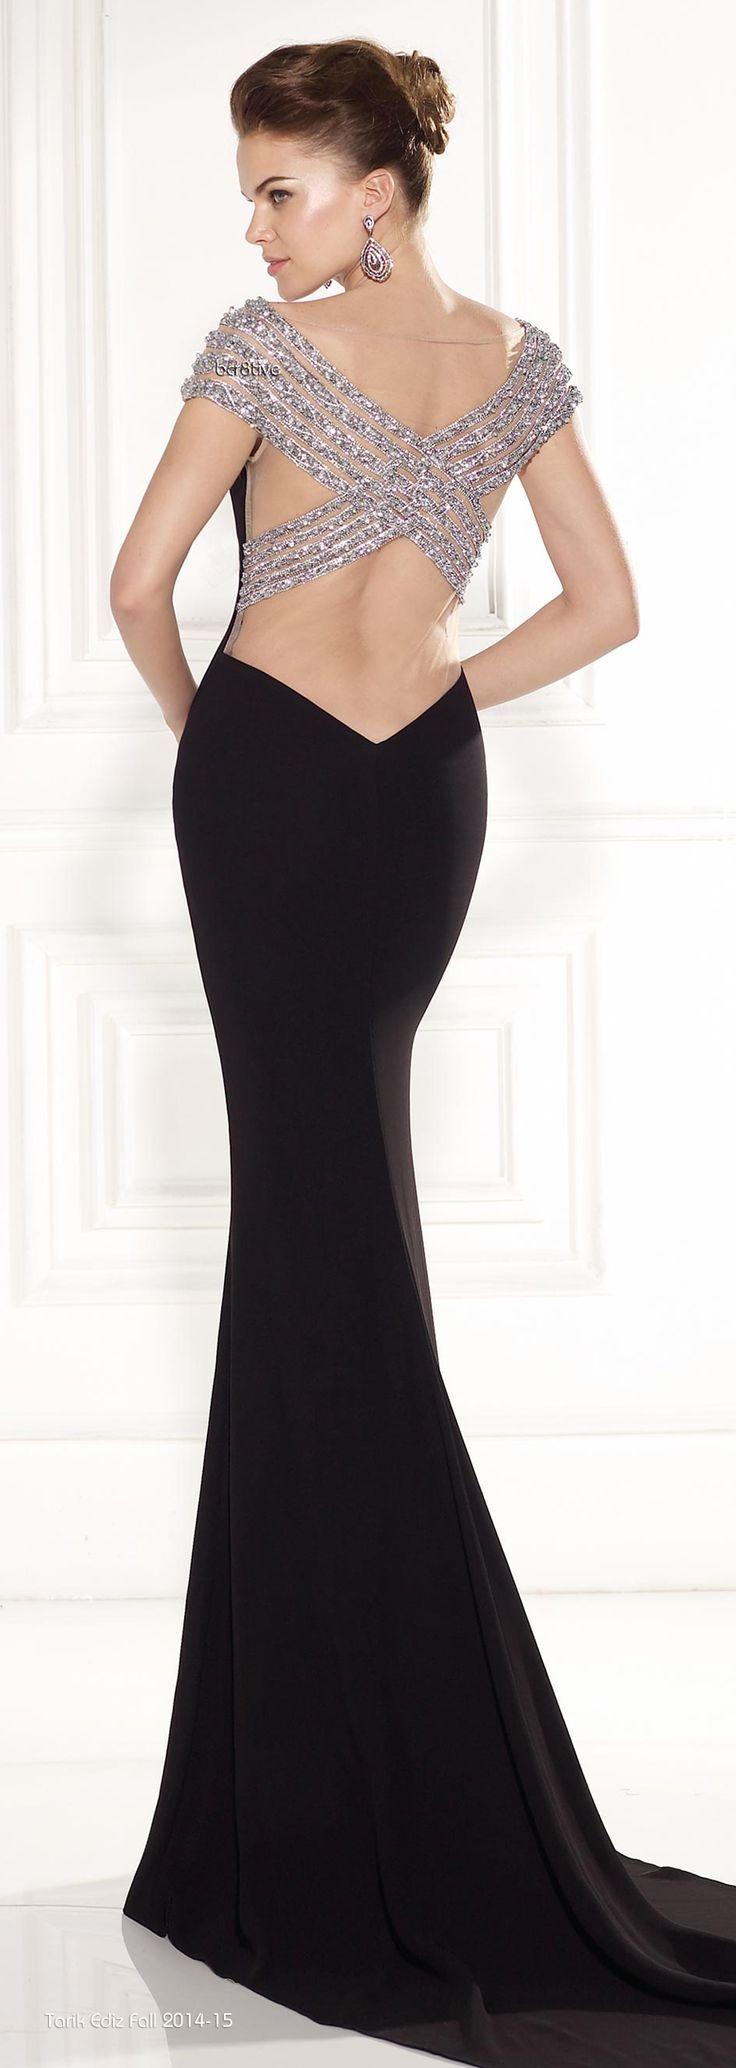 http://siempreguapaconoriflamencsad.blogspot.com/2014/10/vestidos-negros-de-noche-para-una.html